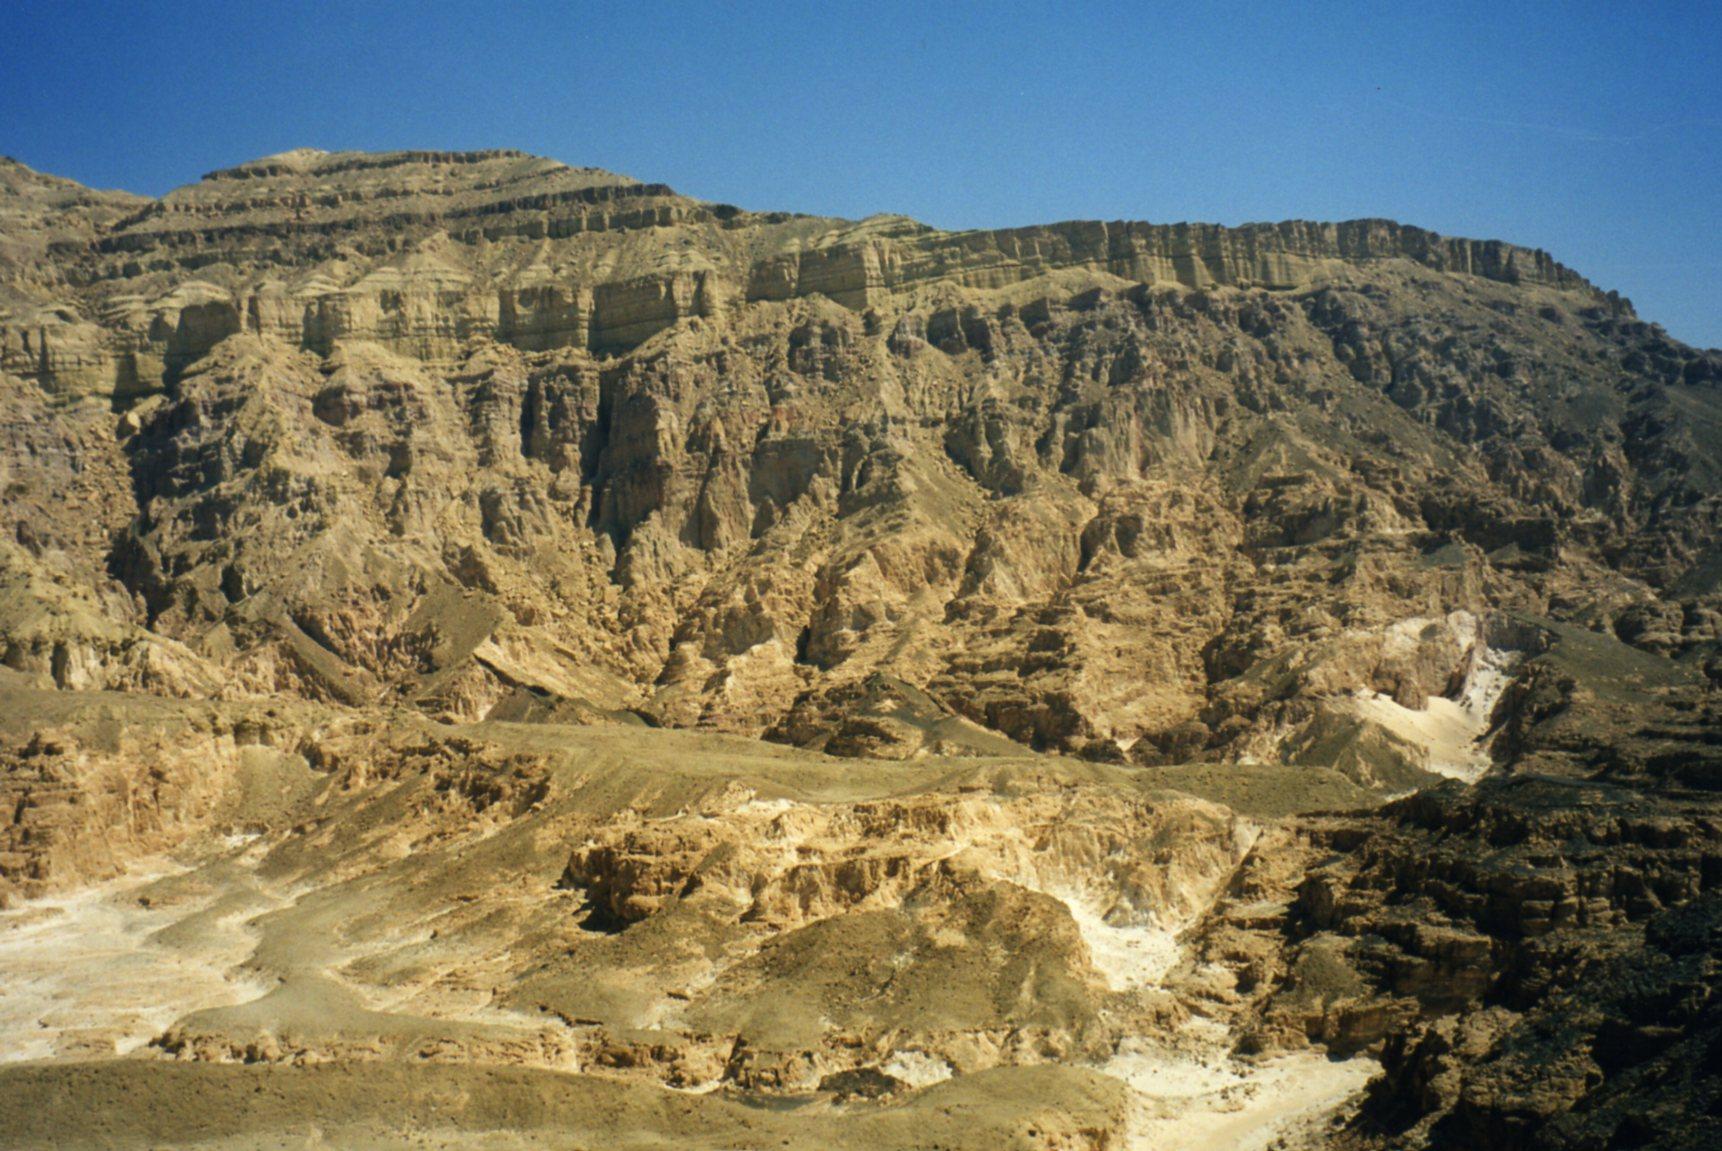 Rugged and barren mountains between Dahab and Sharm el Sheik